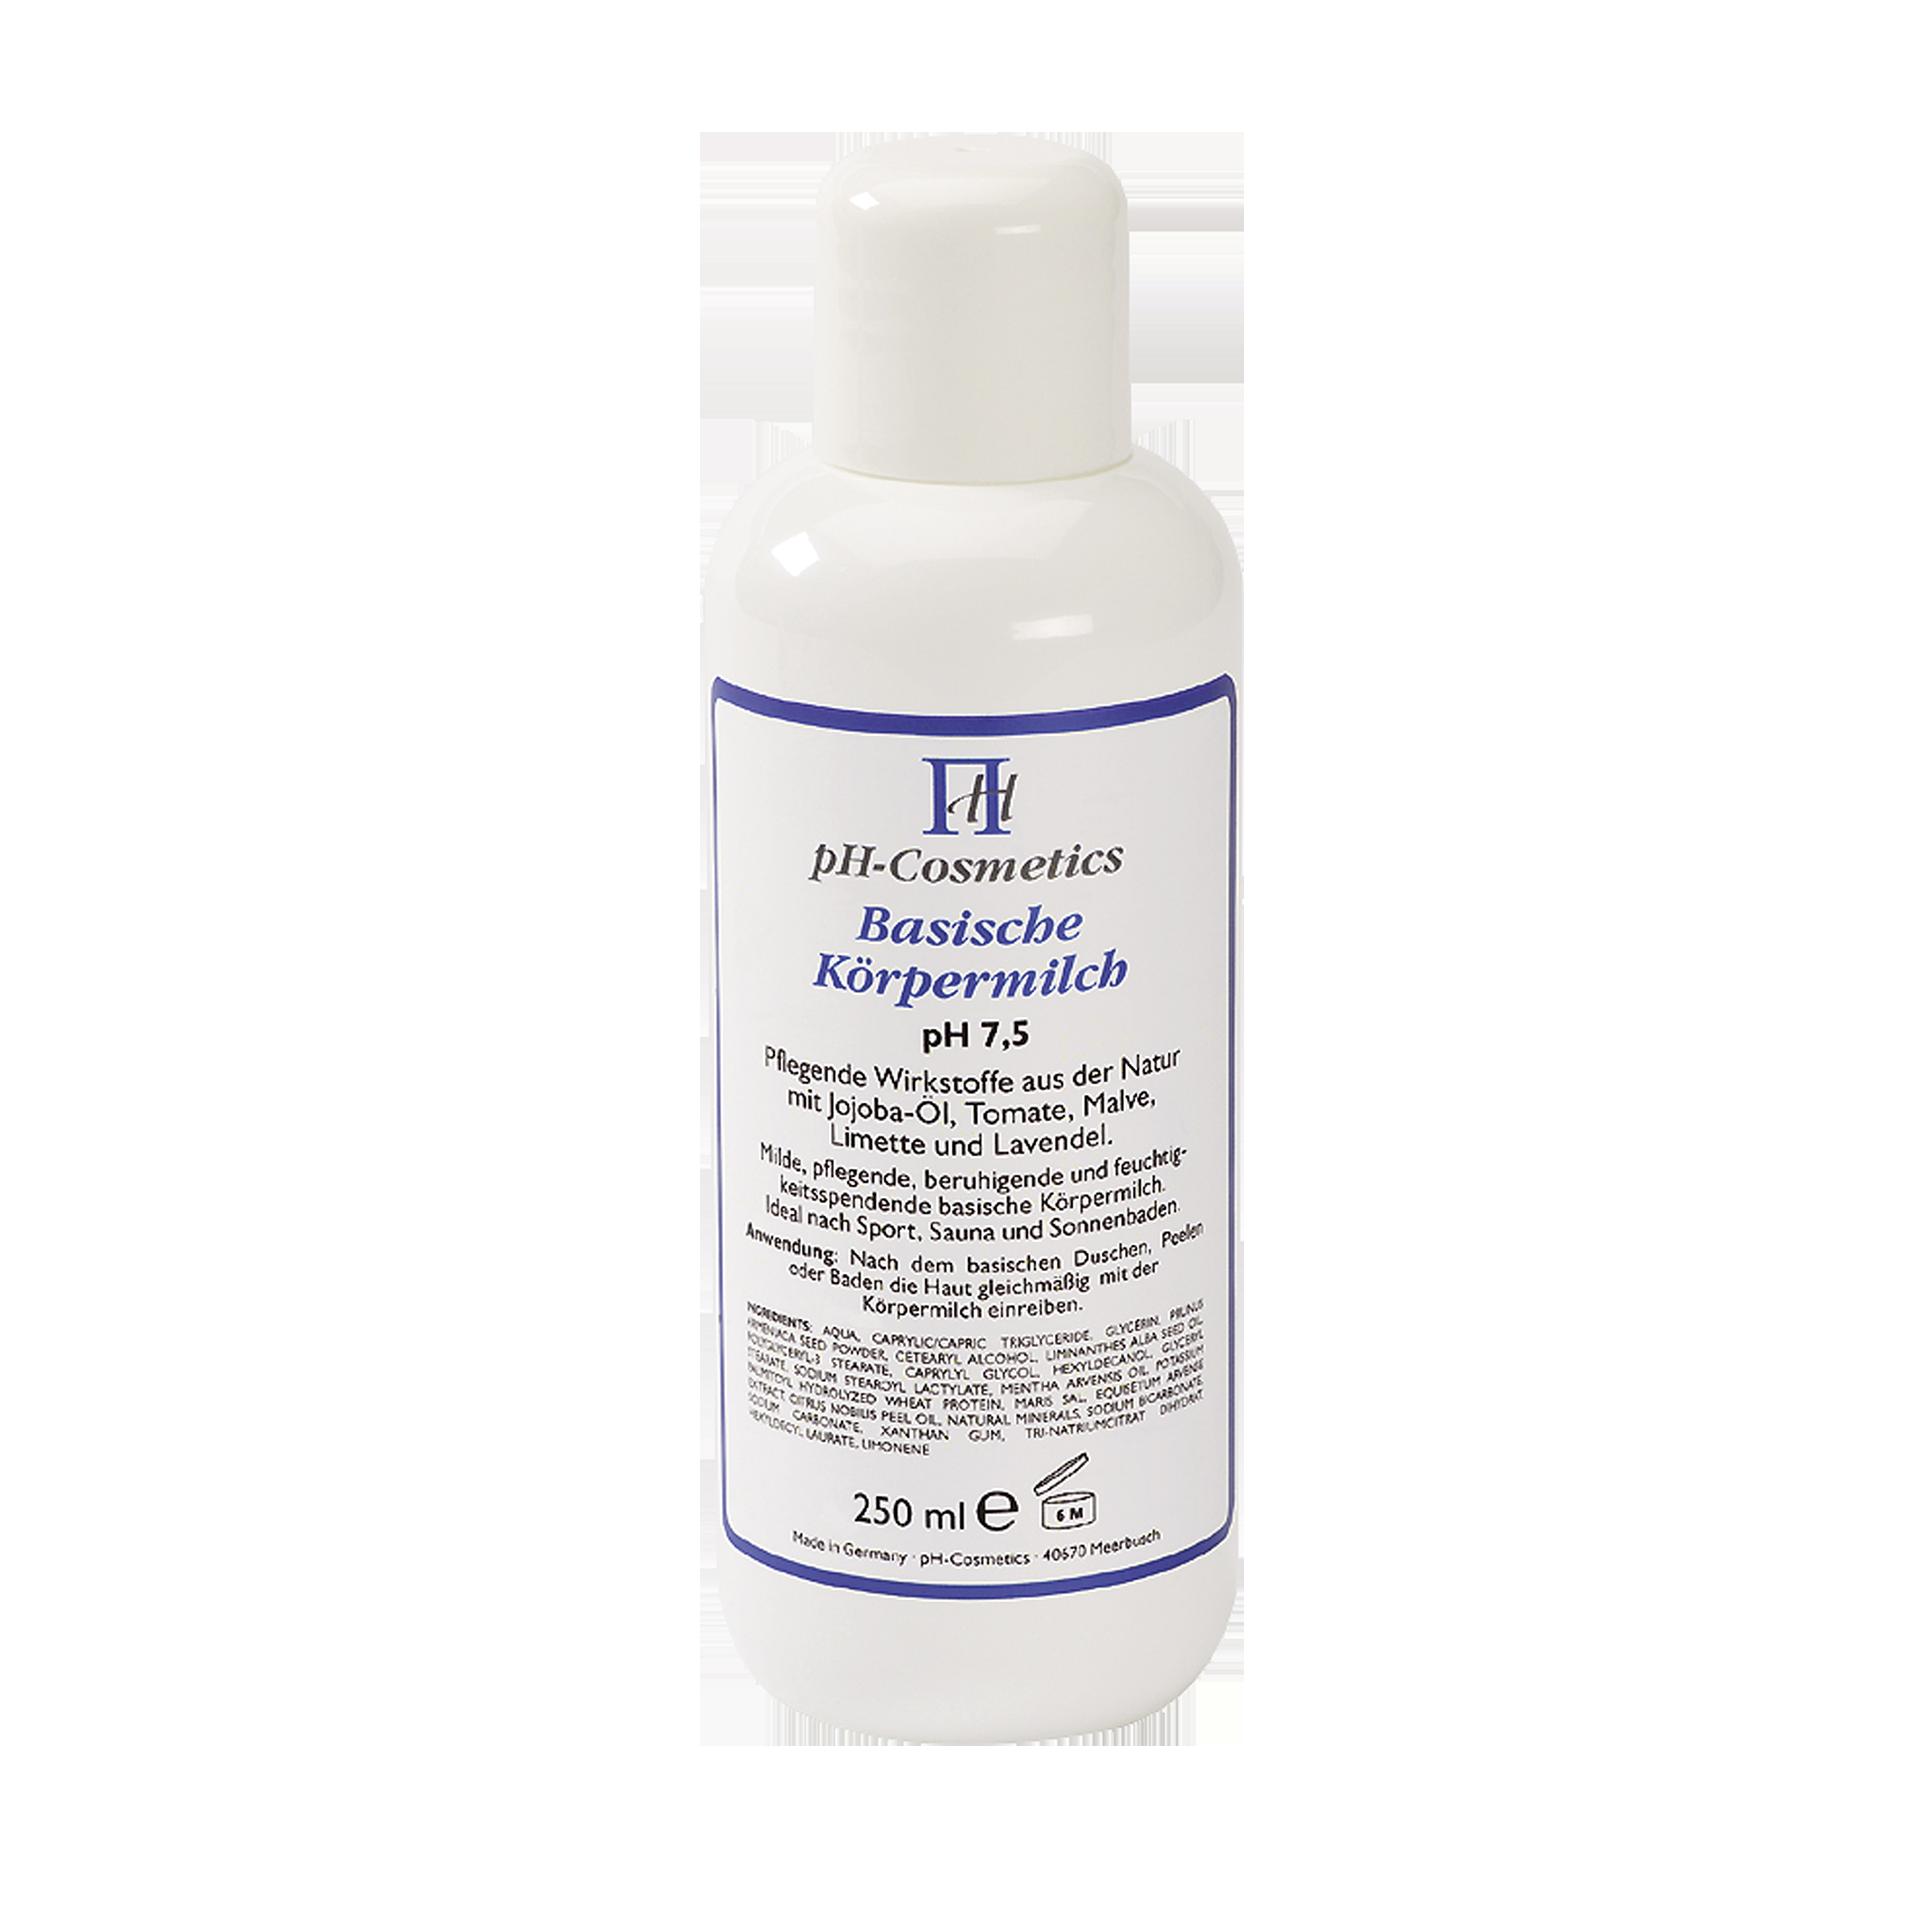 pH-Cosmetics Basische Körpermilch, pH 7.5, 250 ml